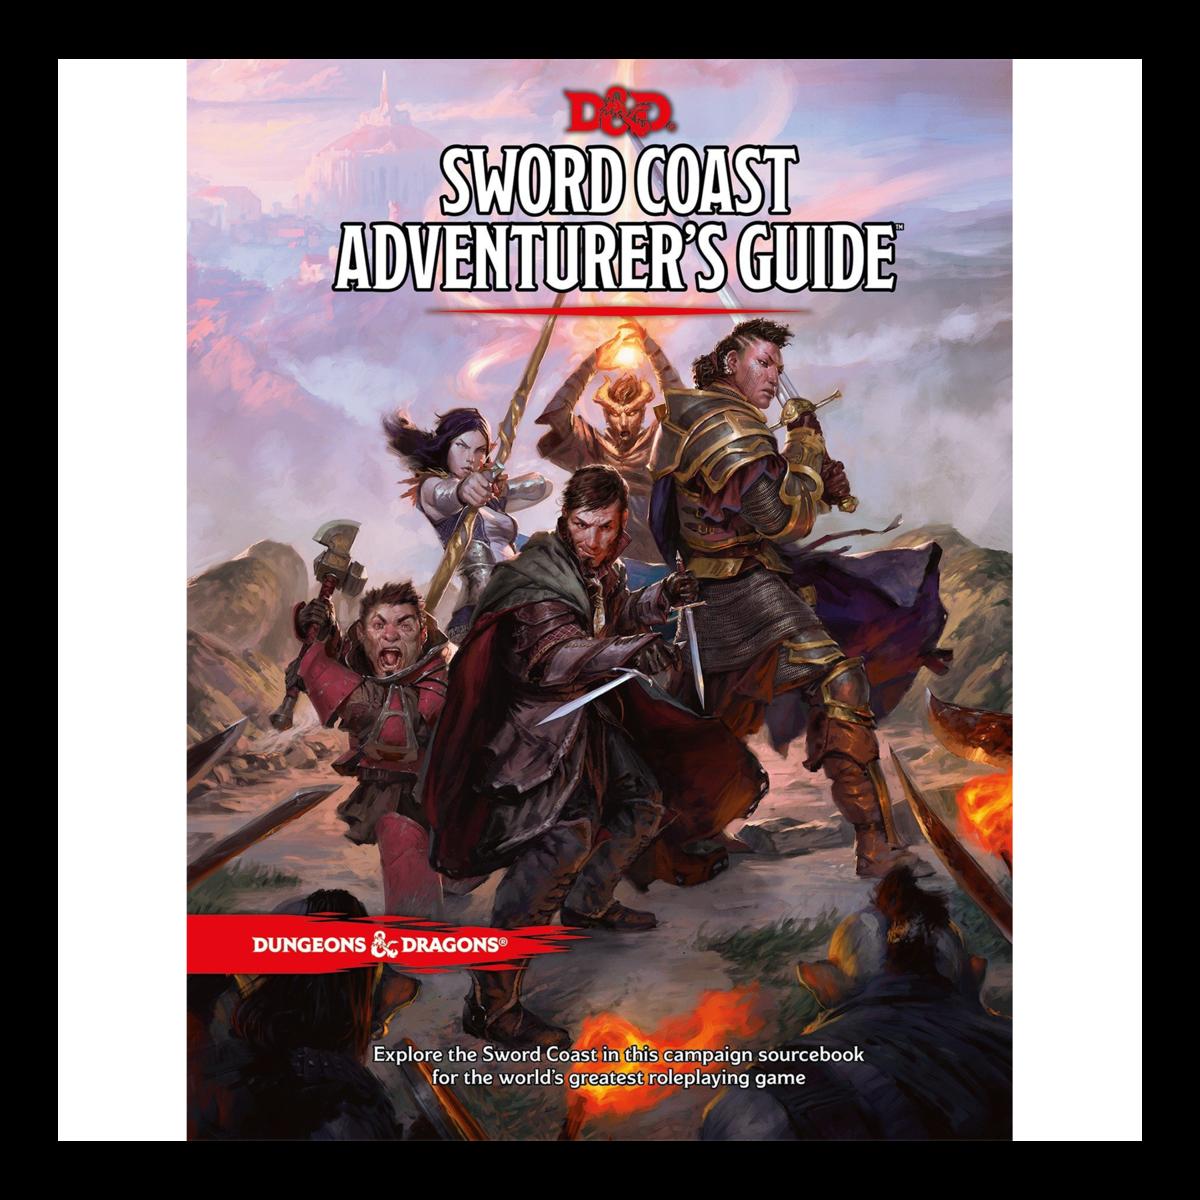 Dungeons & Dragons Sword Coast Adventurer's Guide